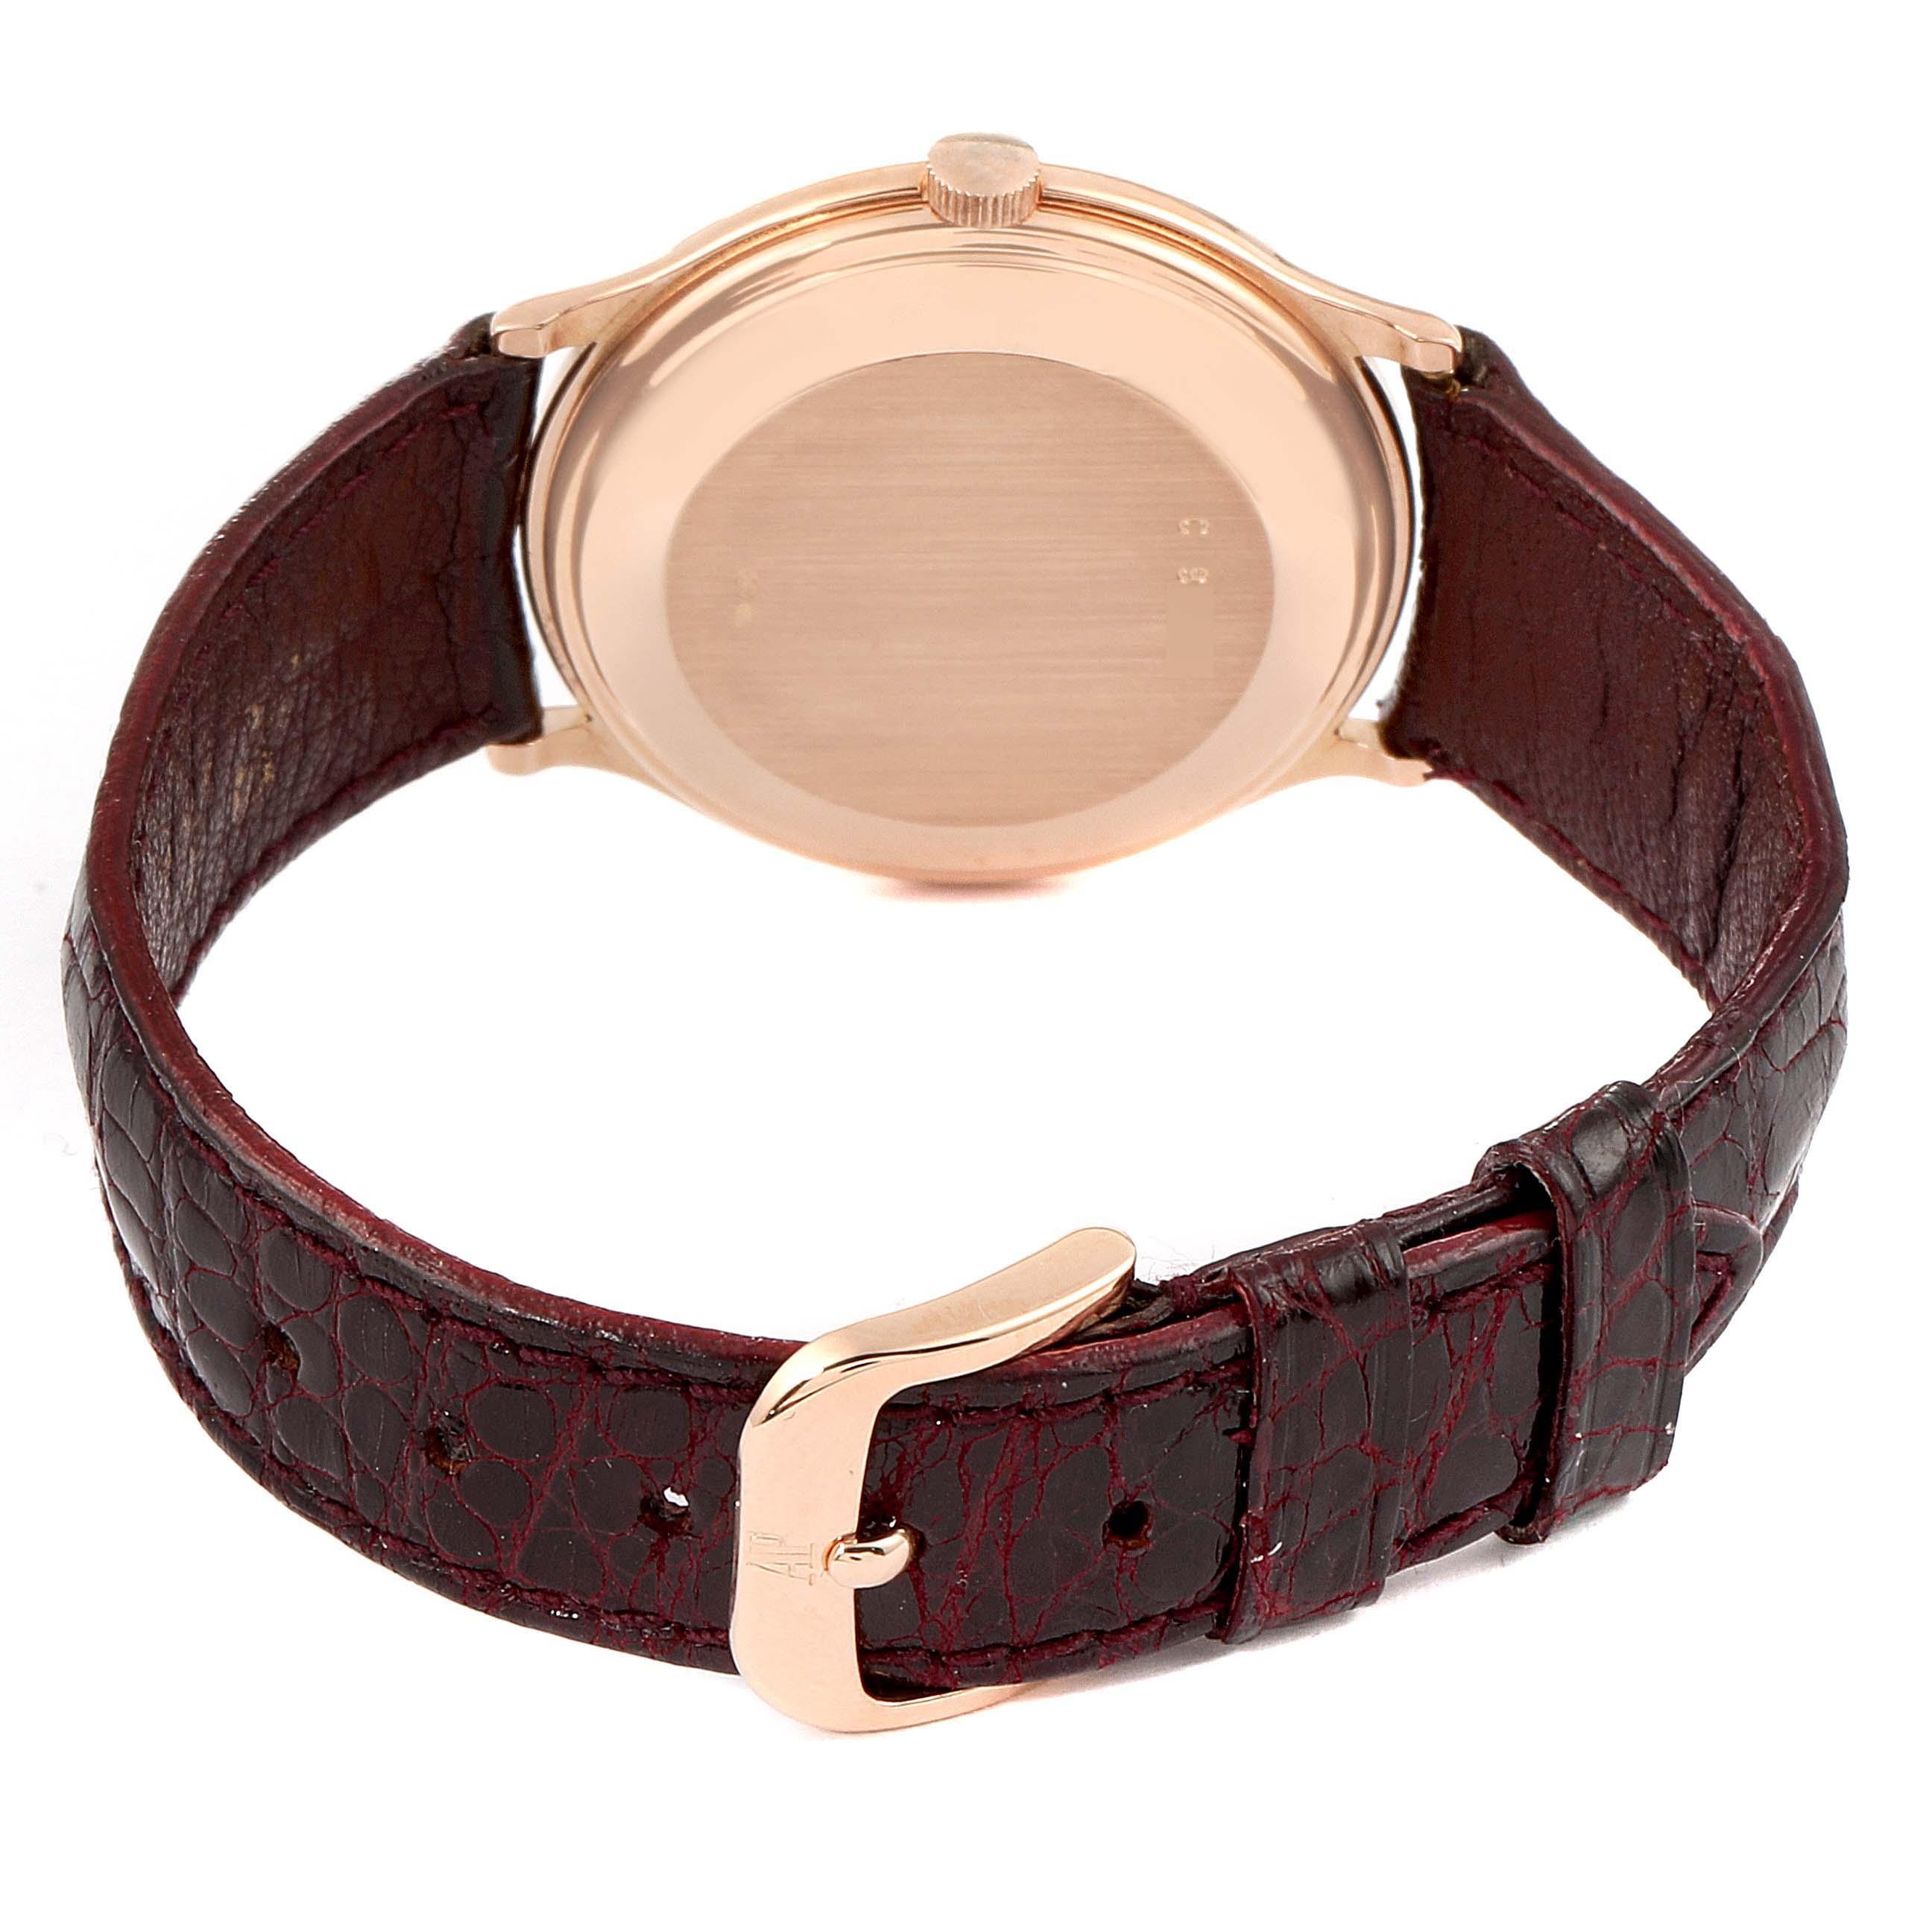 Audemars Piguet Classic Automatic Rose Gold Midsize Unisex Watch 14406BA SwissWatchExpo